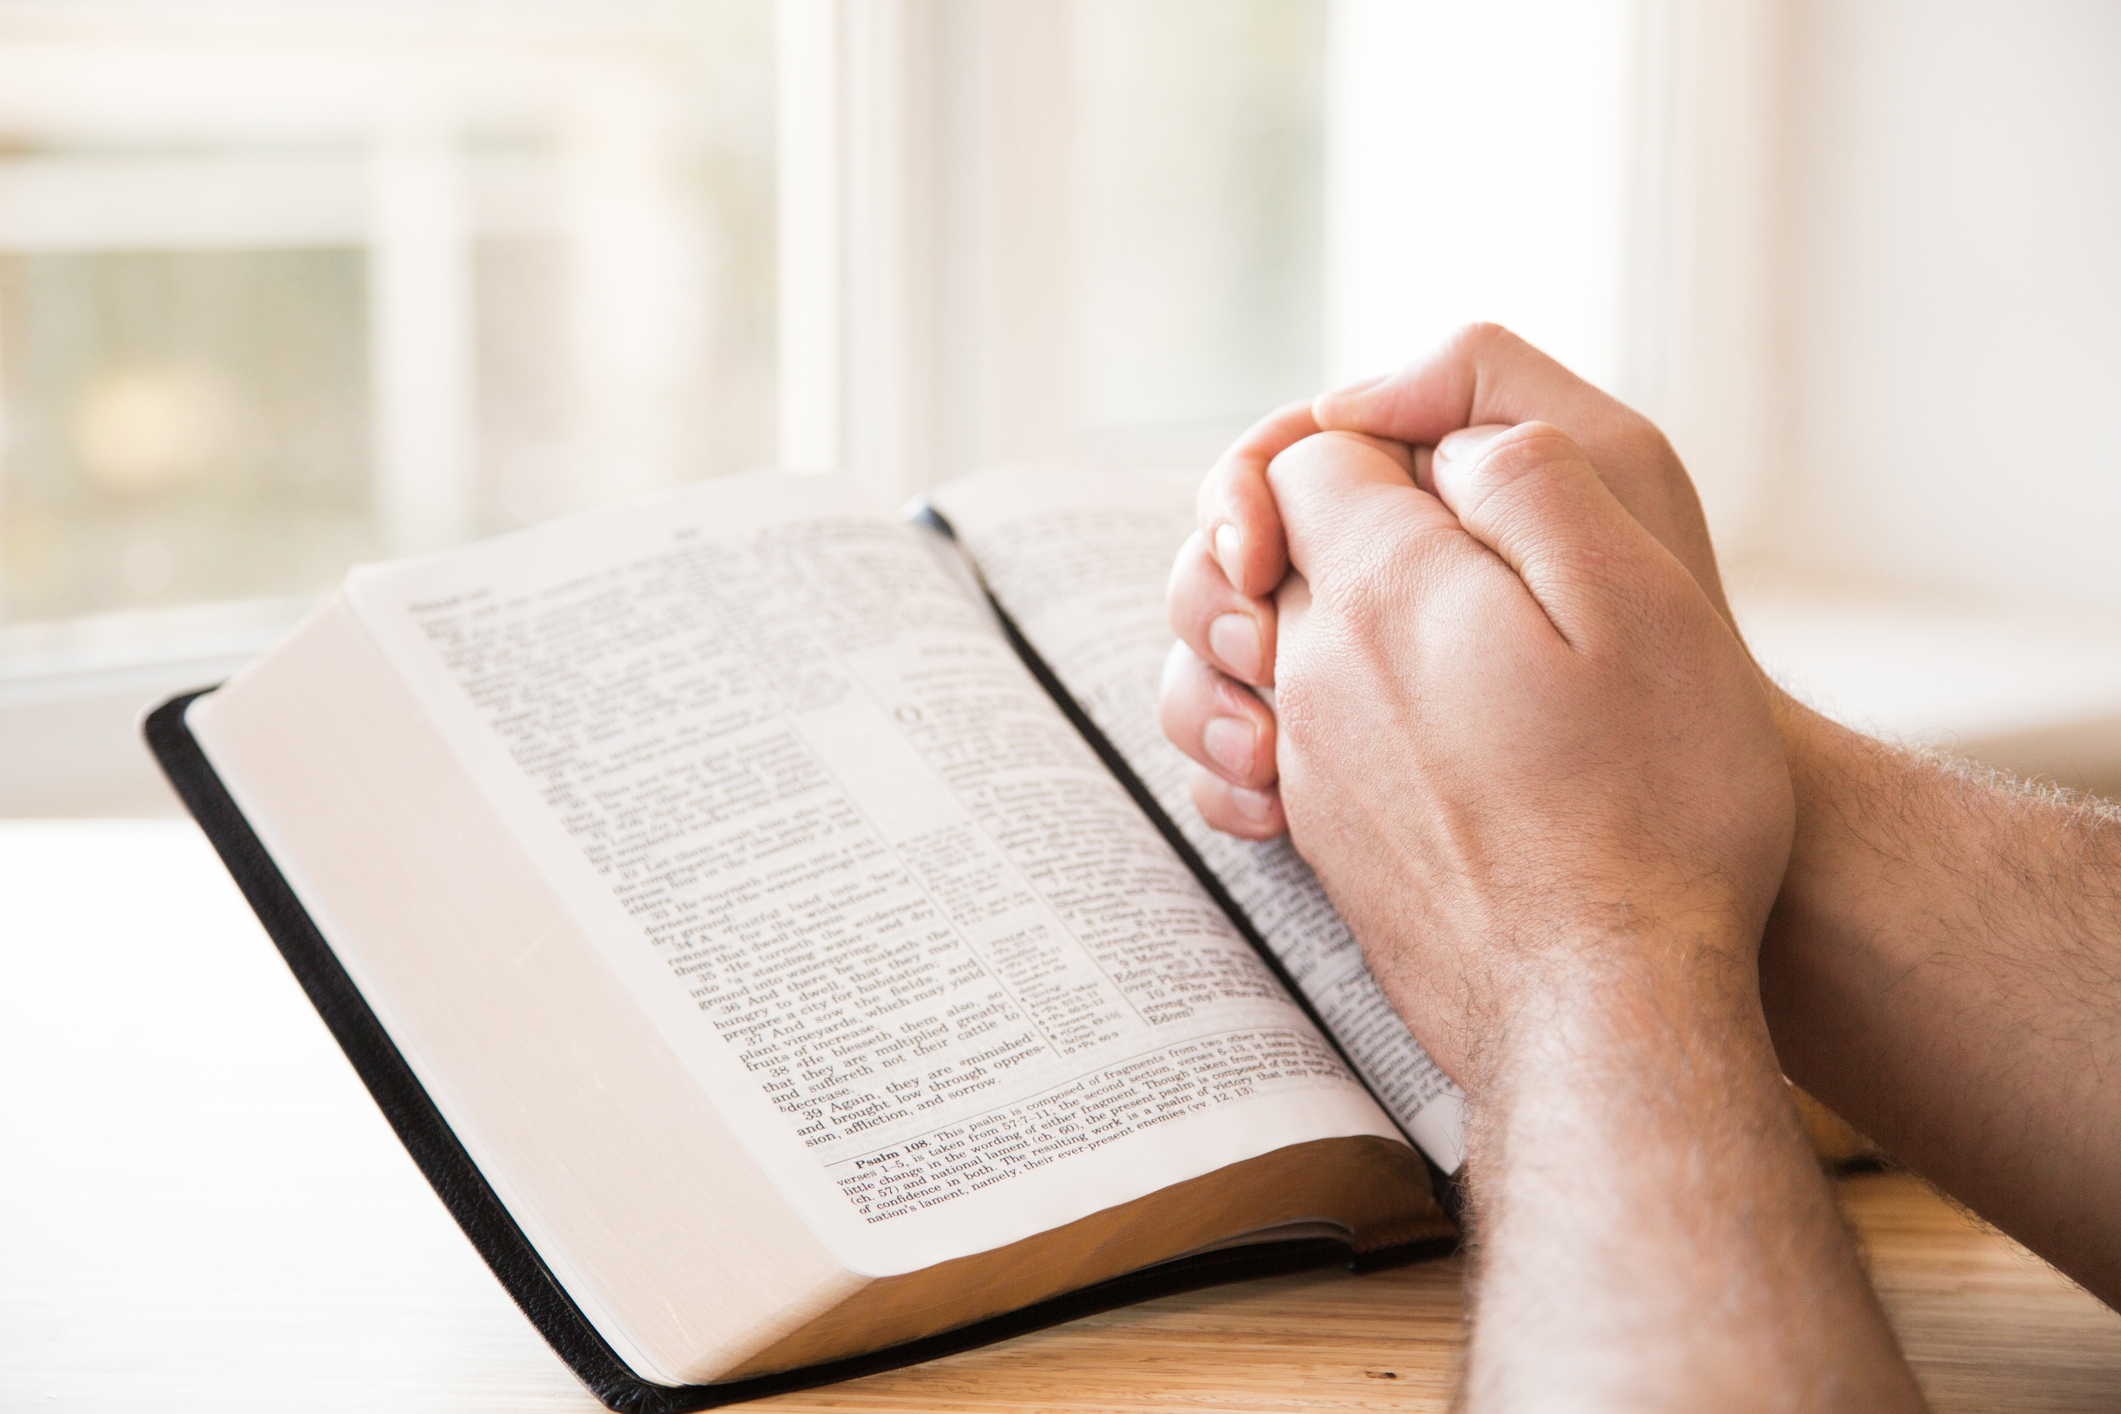 O U R C H U R C H - SERVICESSunday Morning at 11amSunday Night at 6pmADDRESS17159 FM 831Buffalo, TX, 75831United StatesPHONE903.322.1366Pastor John MurrayMOBILE - 281.222.8927HOME - 903.322.6511EMAILSend any inquiries toJohnthebaptist60@att.netMAILING ADDRESSFlo Community Baptist ChurchP.O. Box 37Buffalo, TX, 75831United States